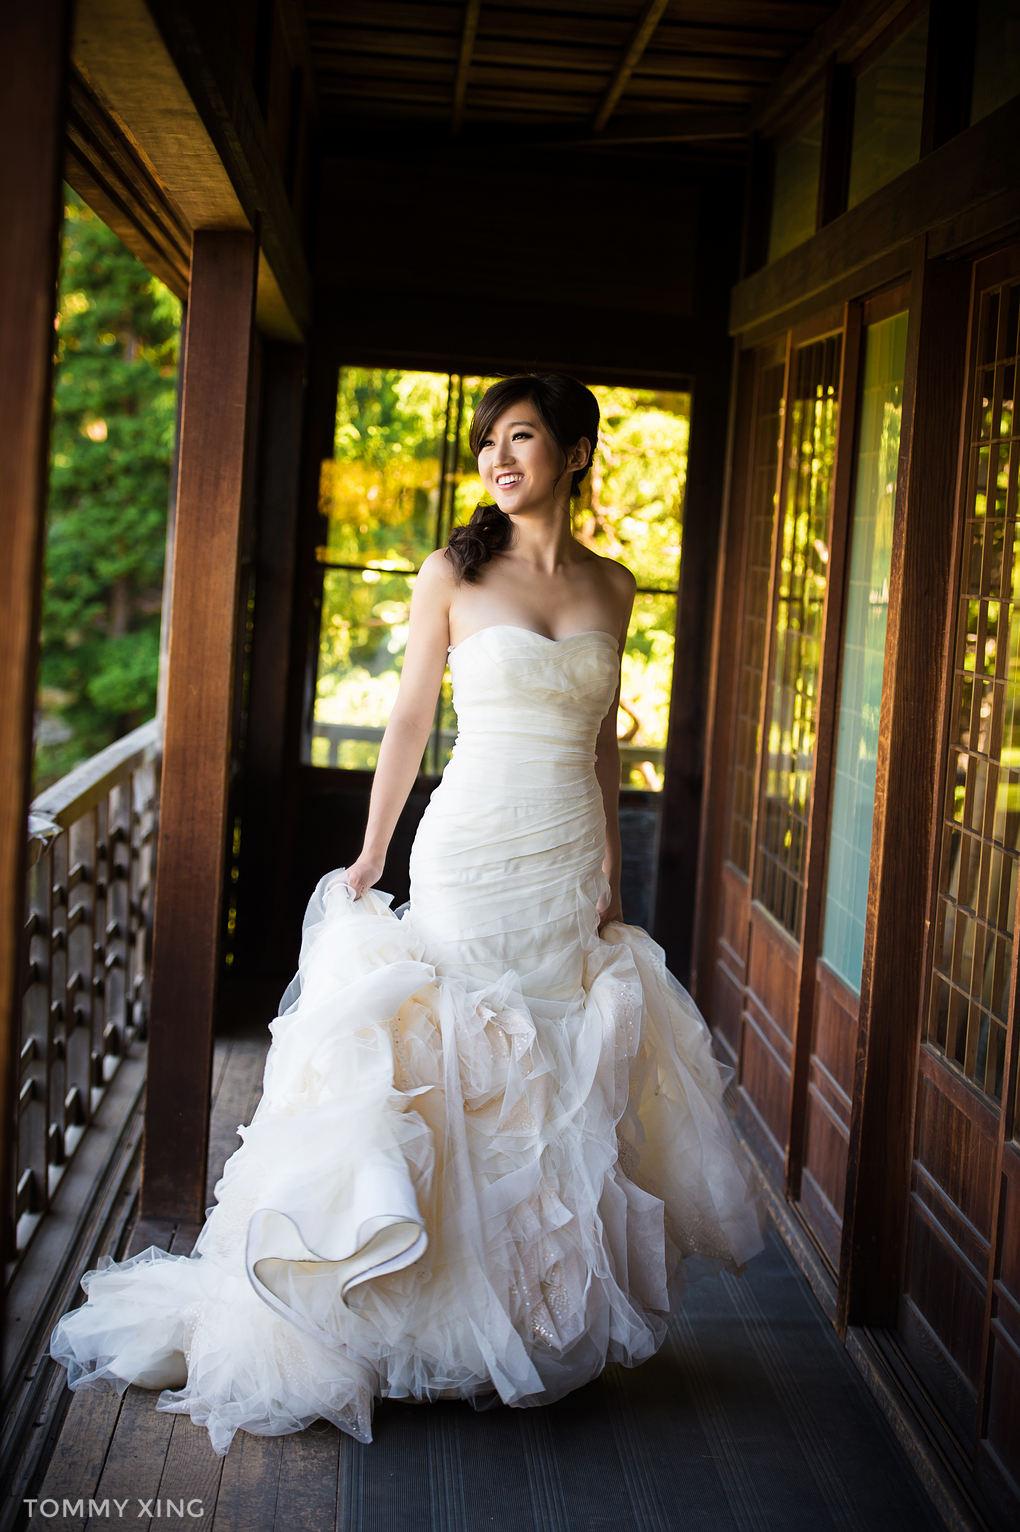 San Francisco bay area pre wedding - 旧金山湾区婚纱照 - Tommy Xing 4.jpg